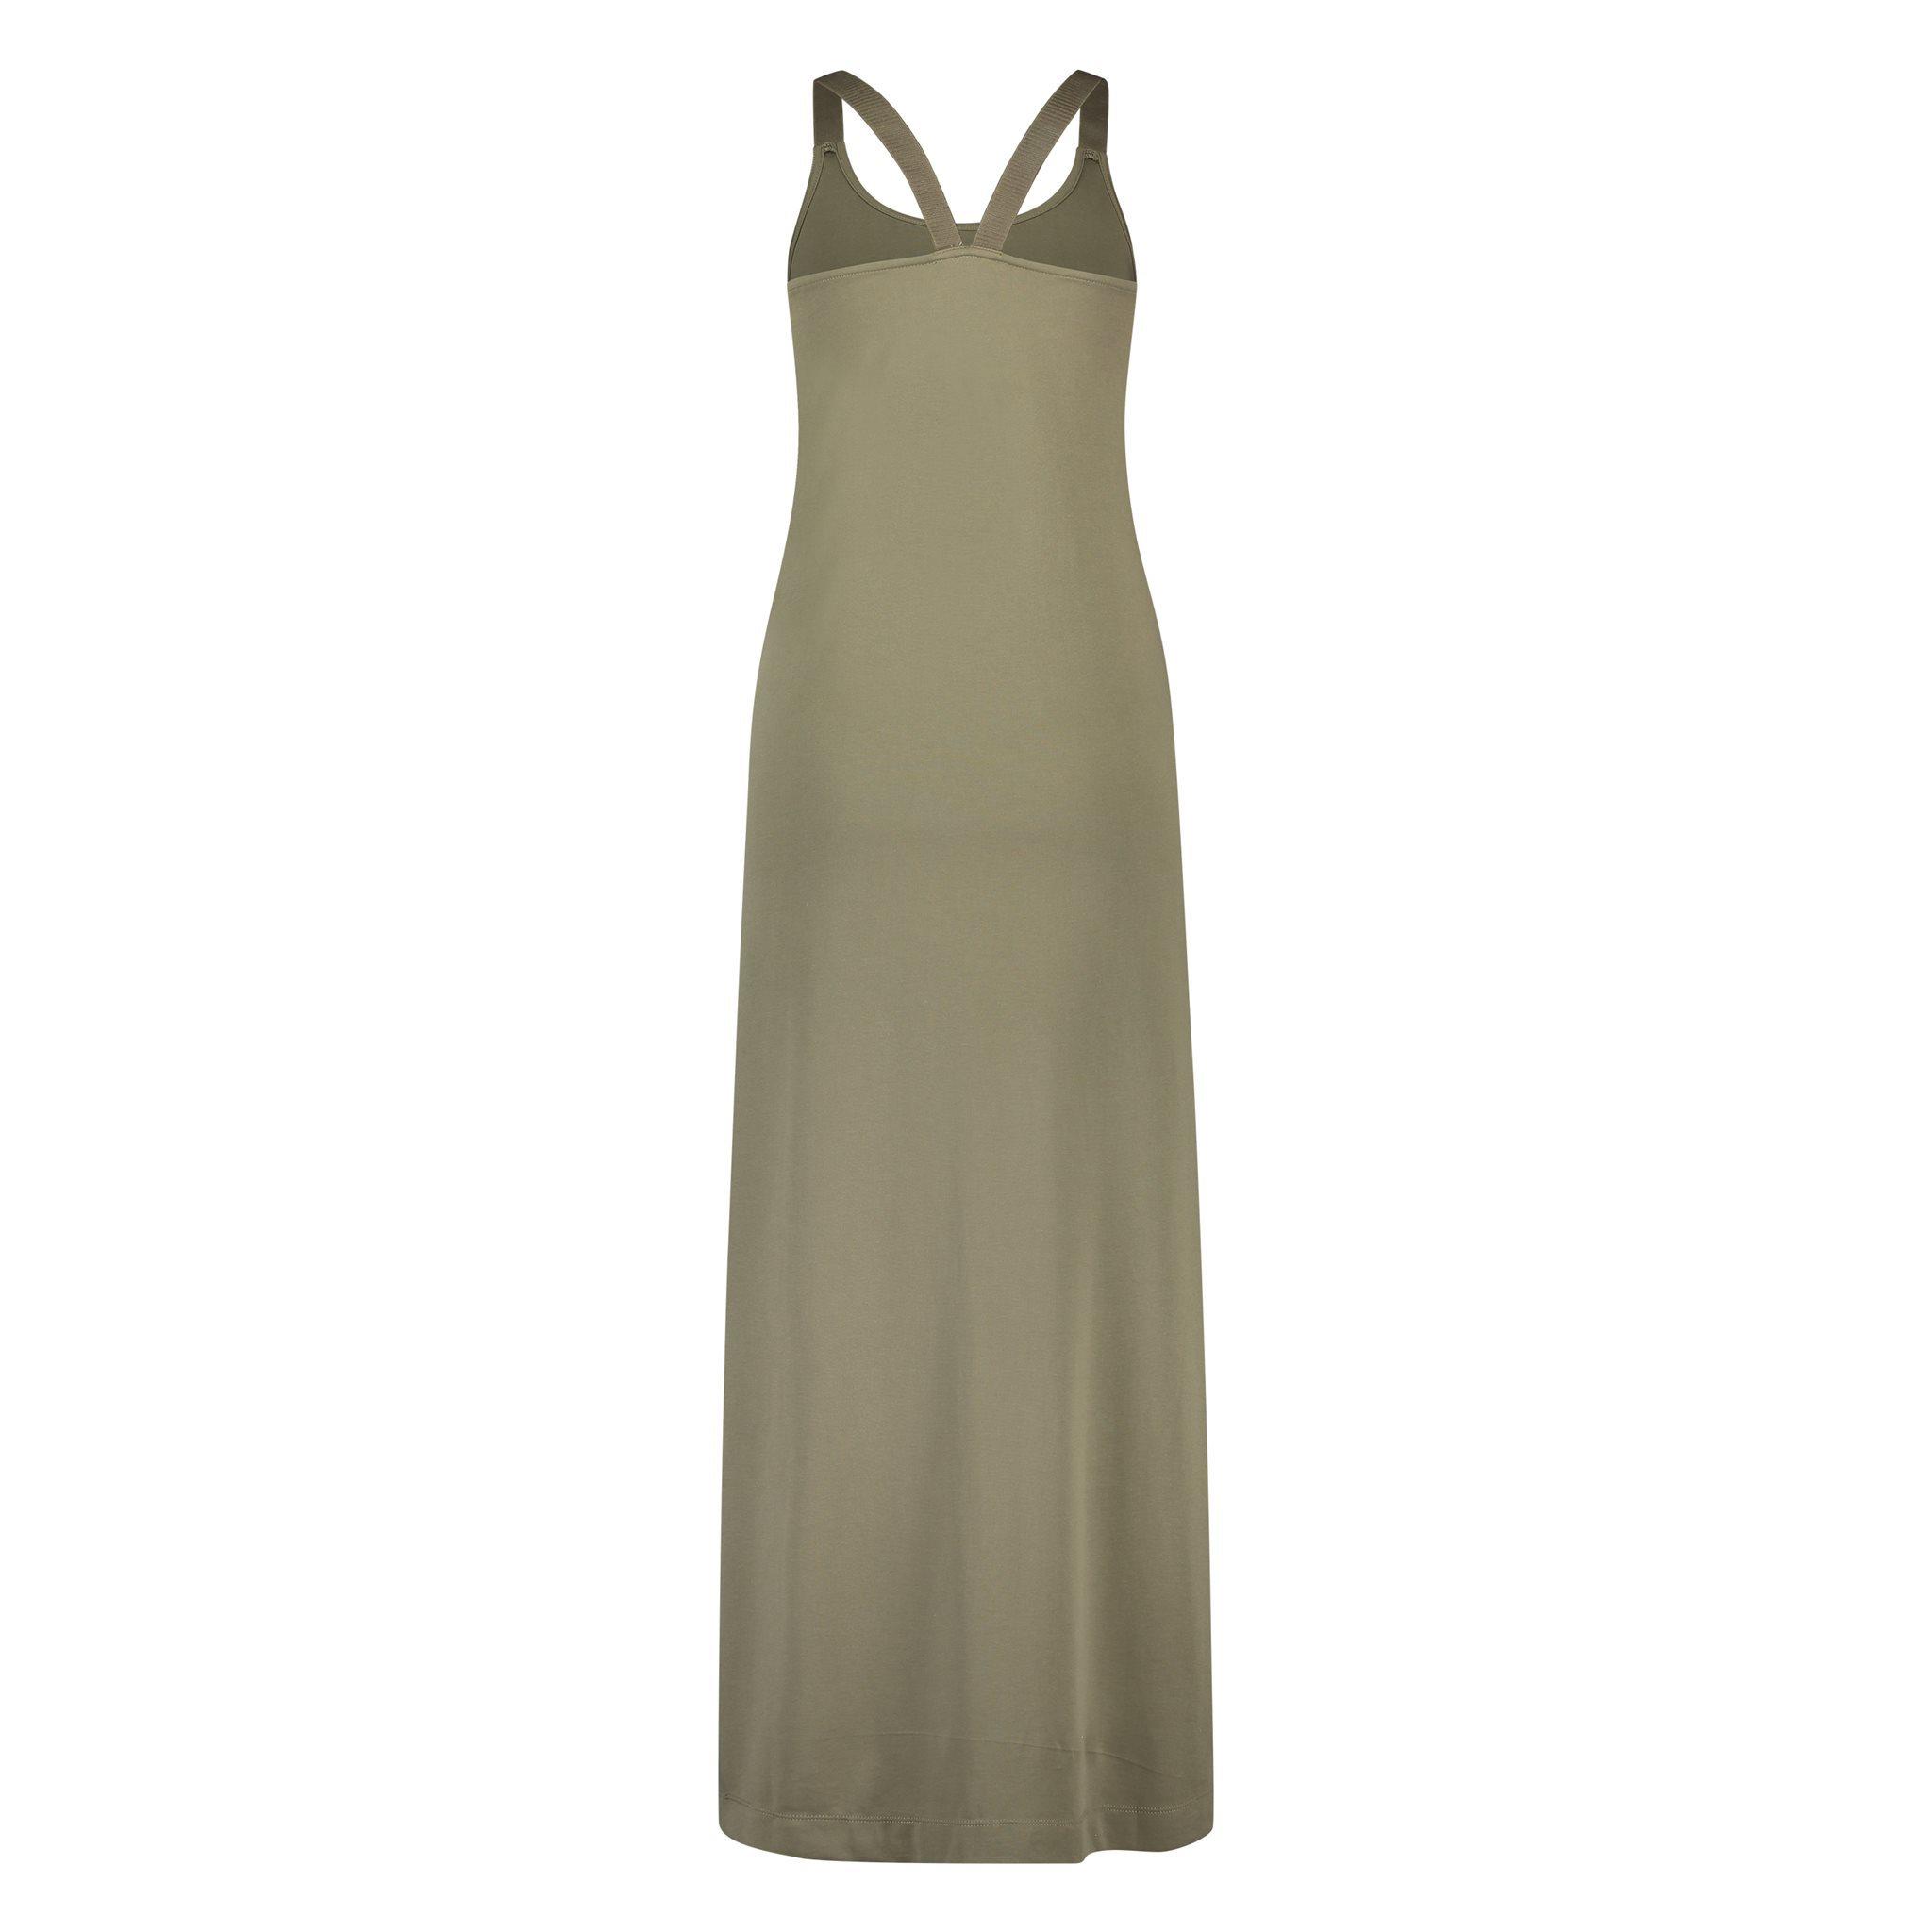 Mave Dress